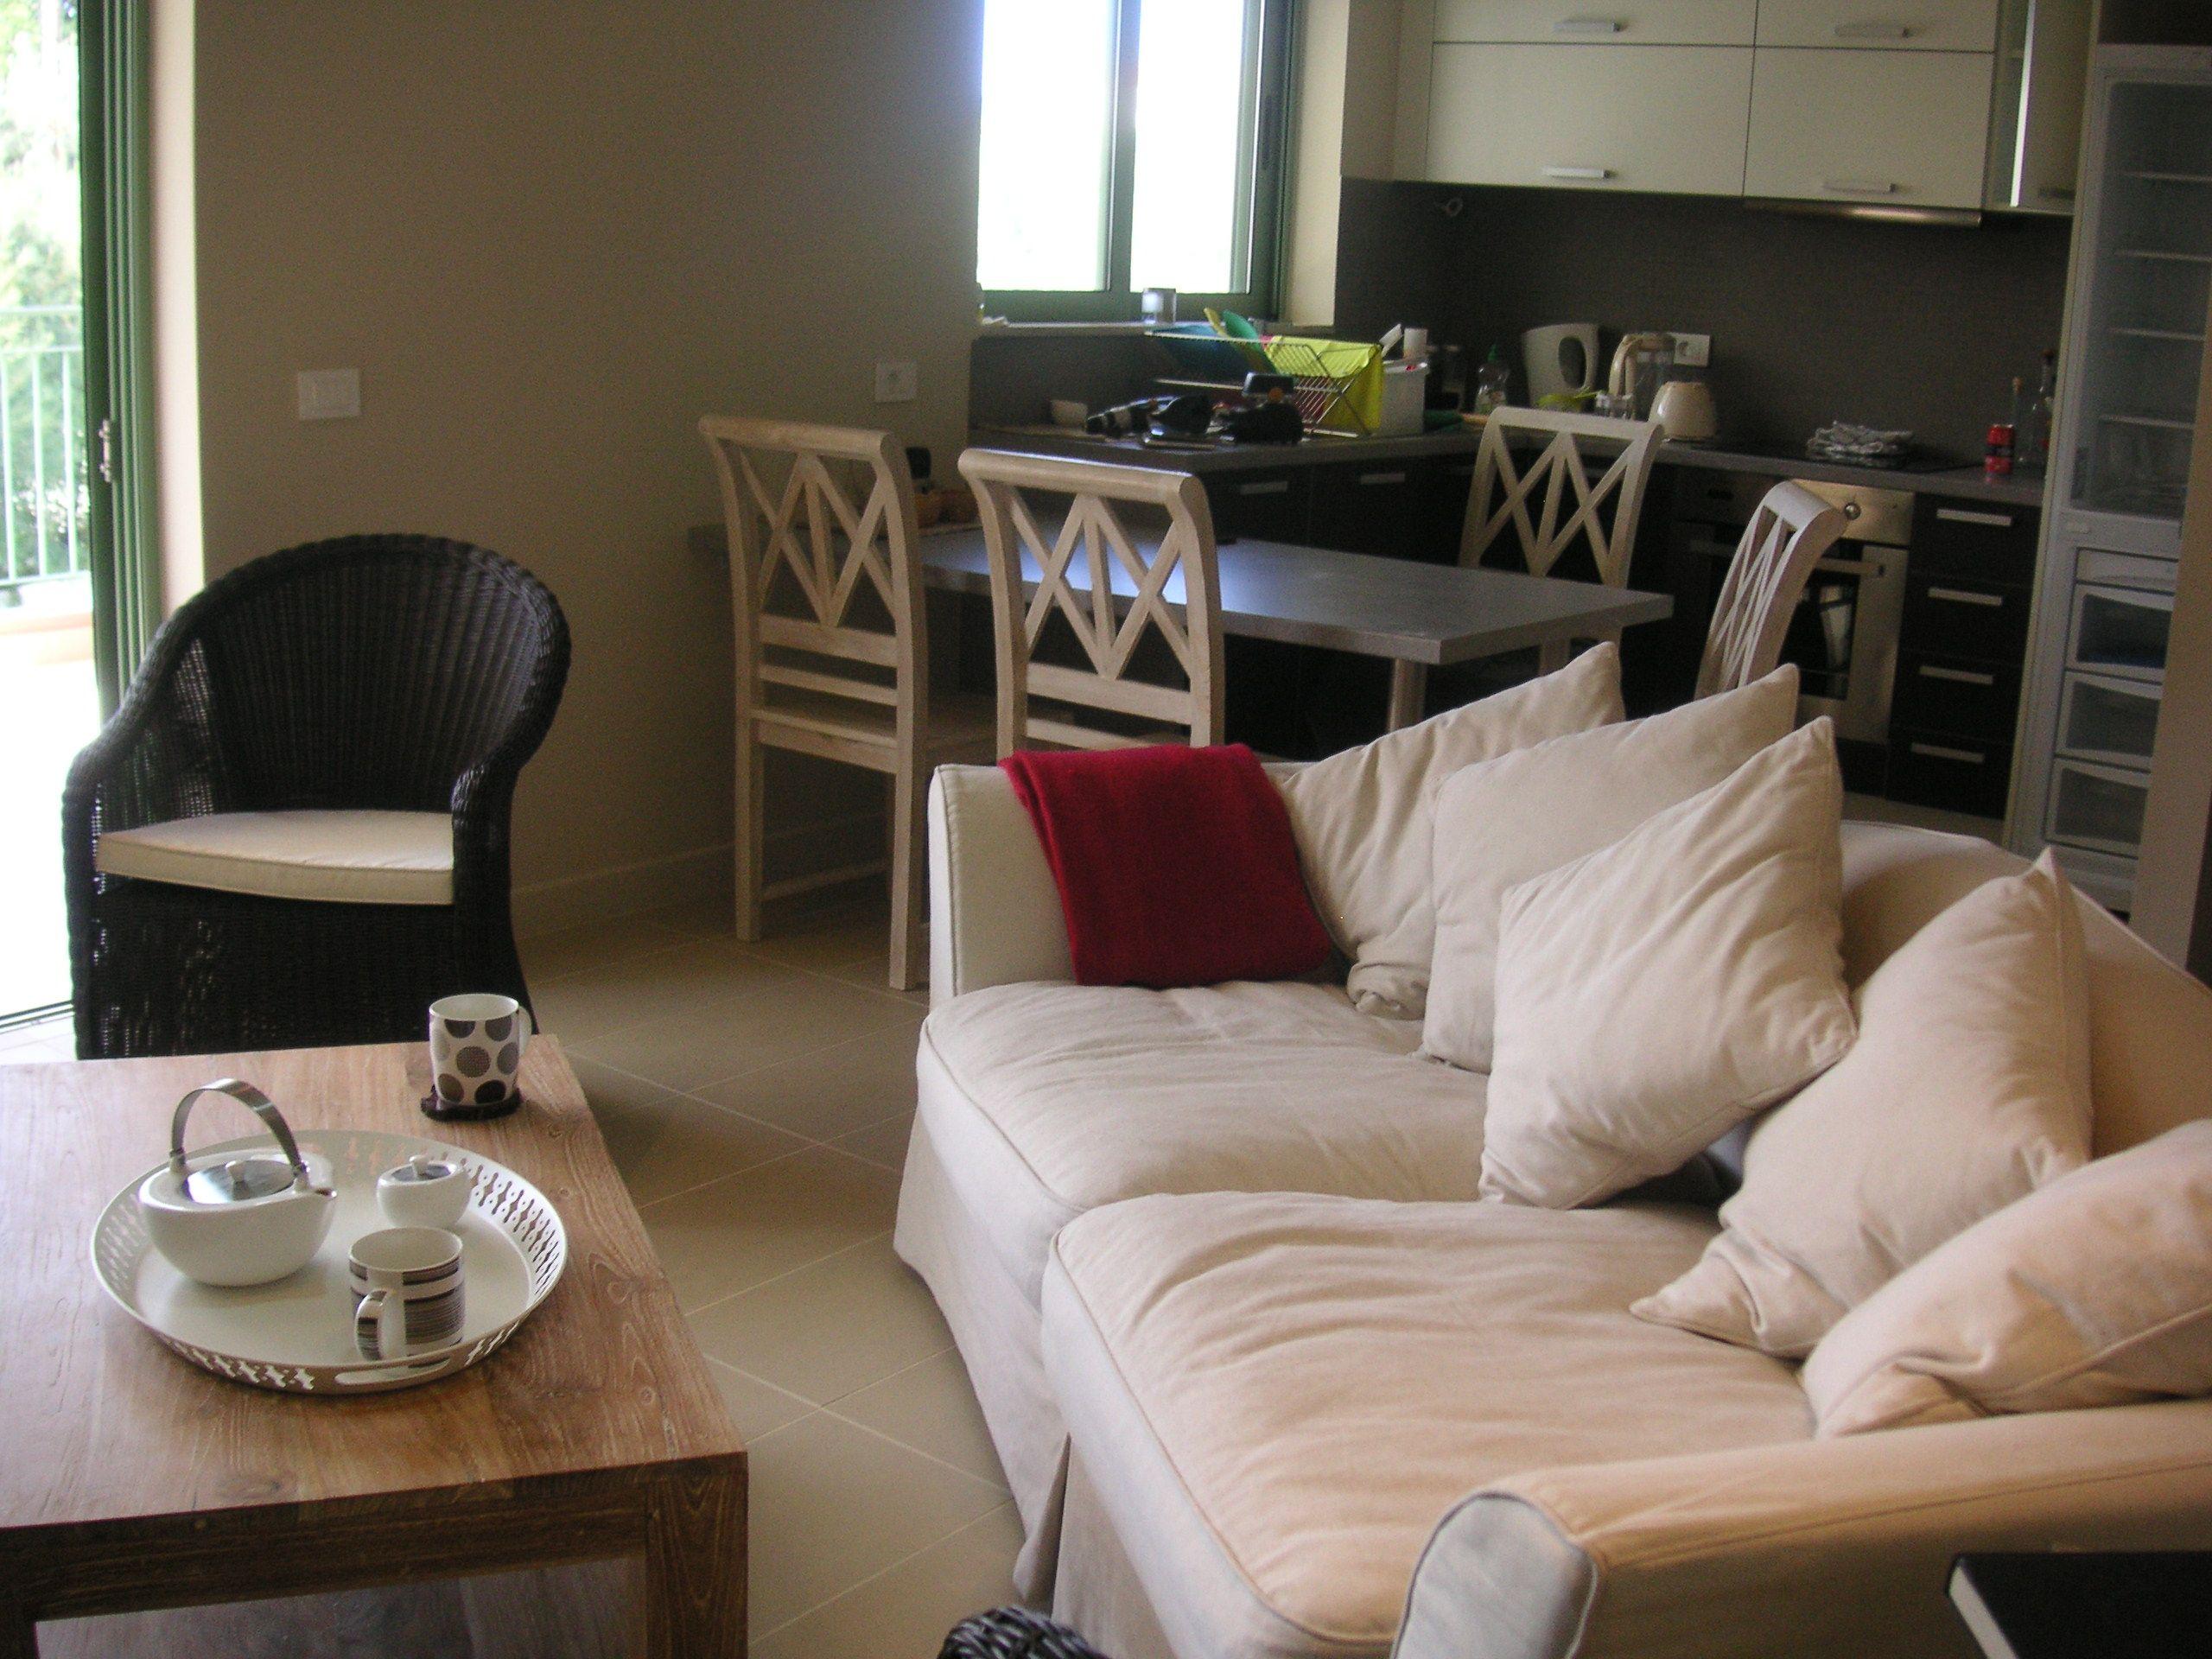 Bright living spaces